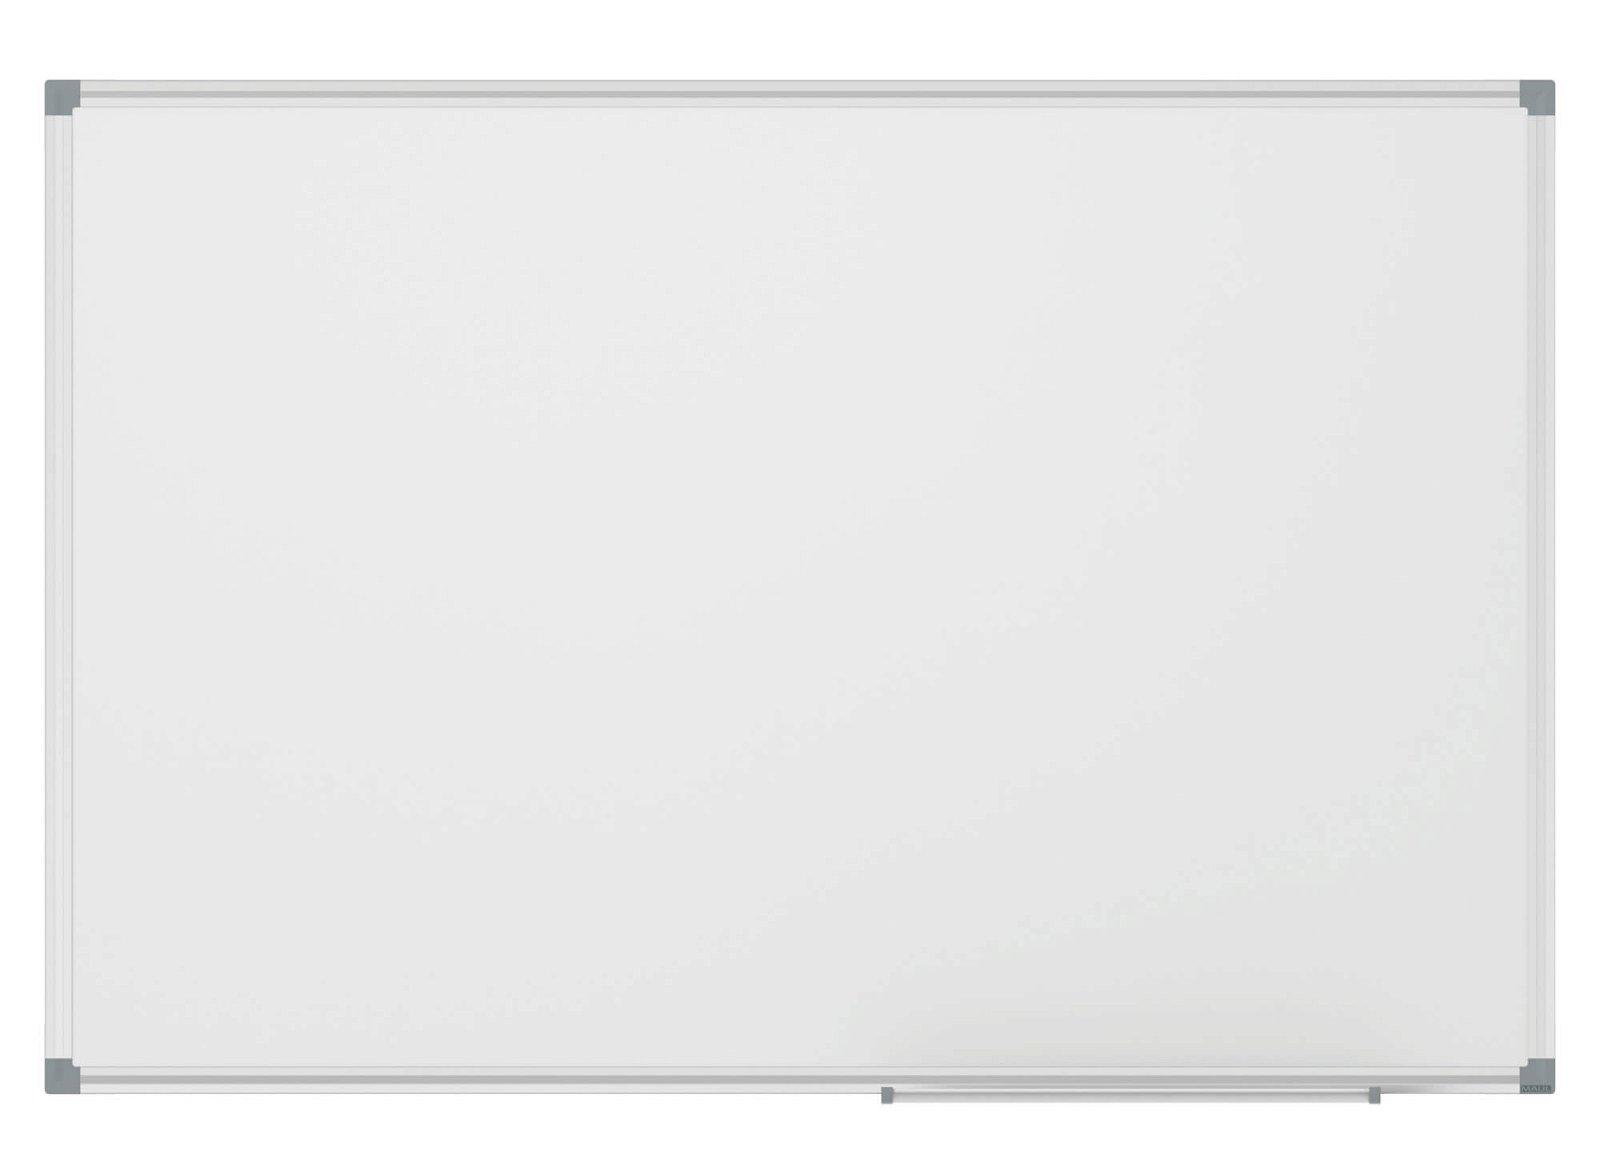 Whiteboard MAULstandard, Emaille, 100x200 cm, grau